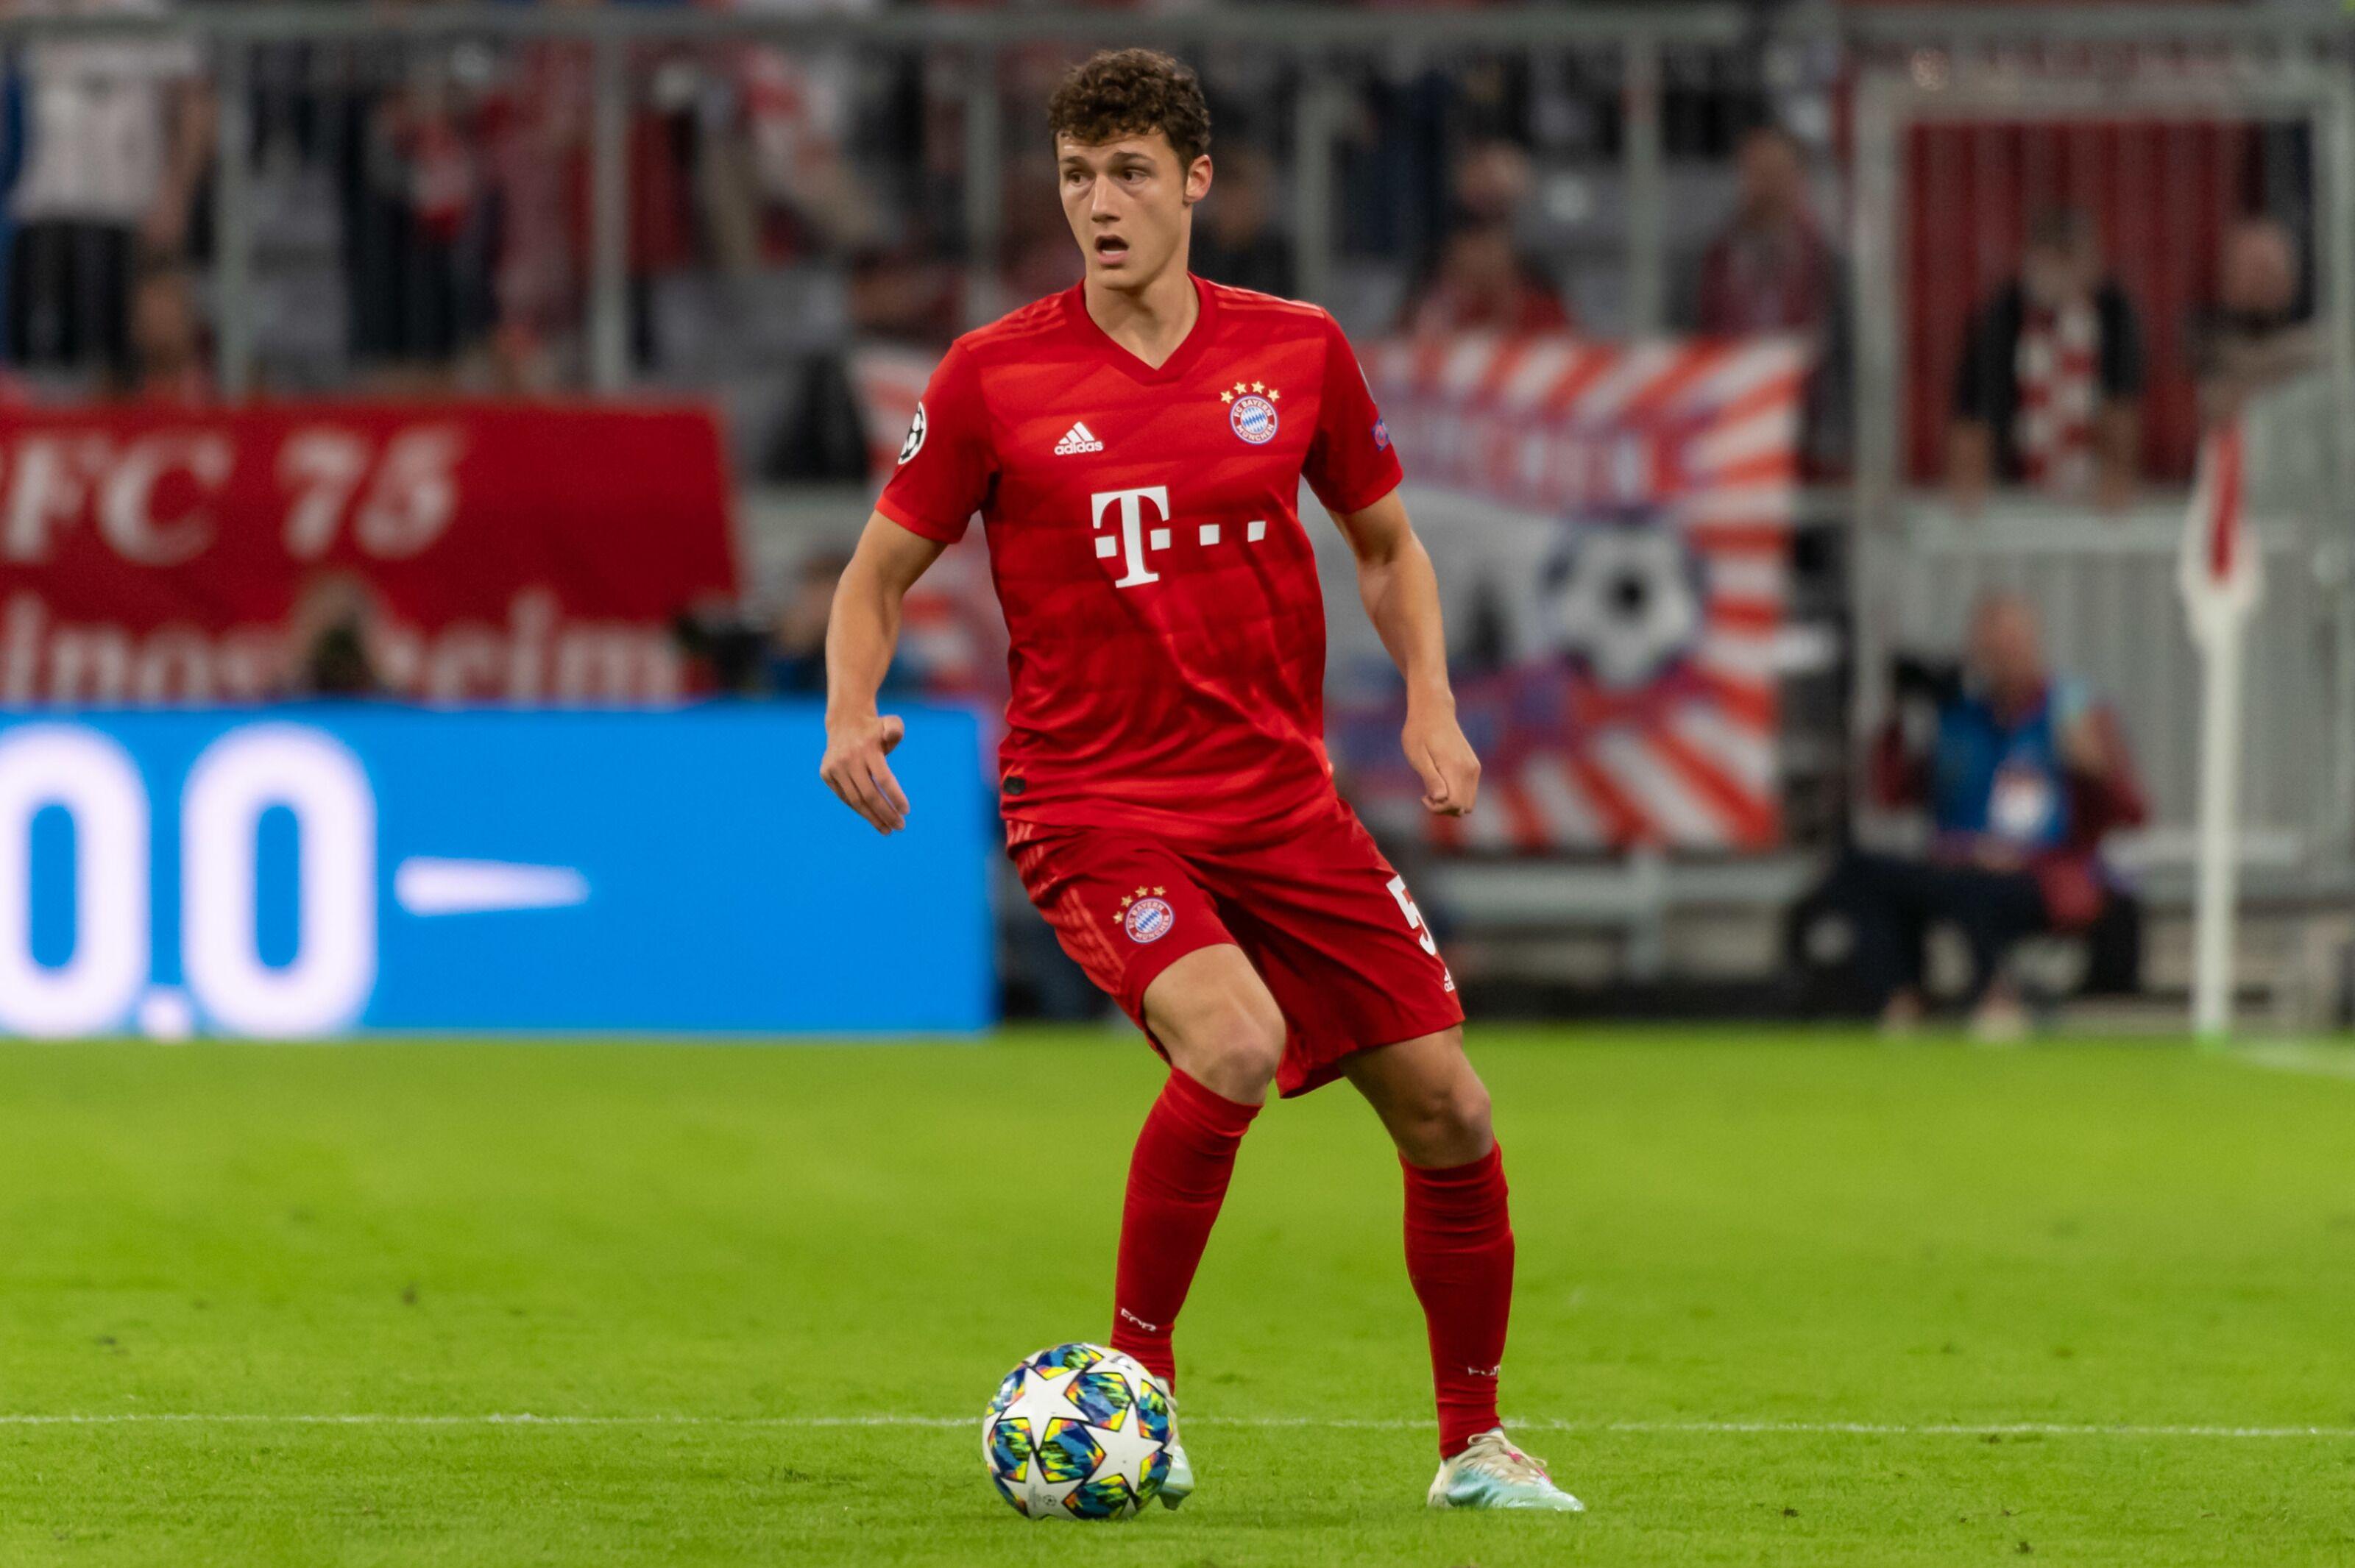 Uli Hoeness backs Benjamin Pavard to be successful for Bayern Munich